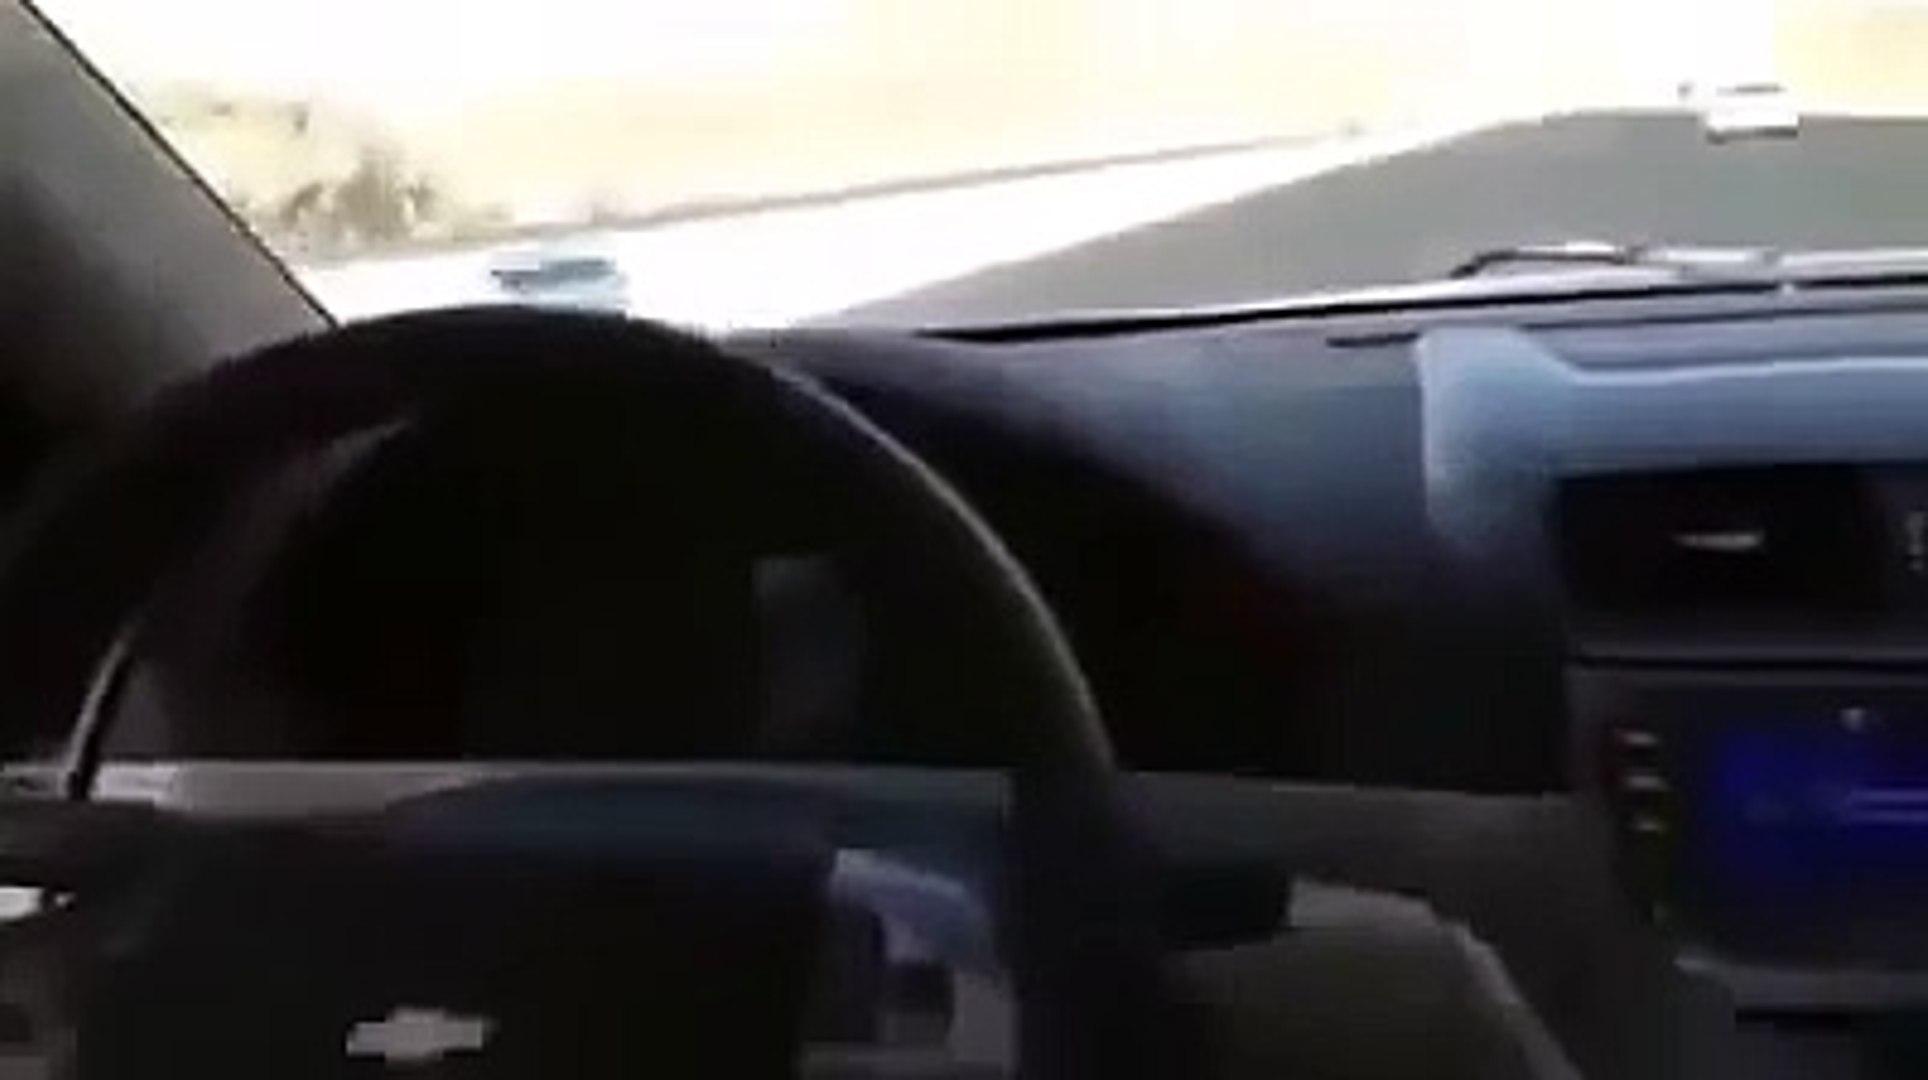 Wild Arab Drift at the Speed of 230 km/h Arab drifting 230 KM/H